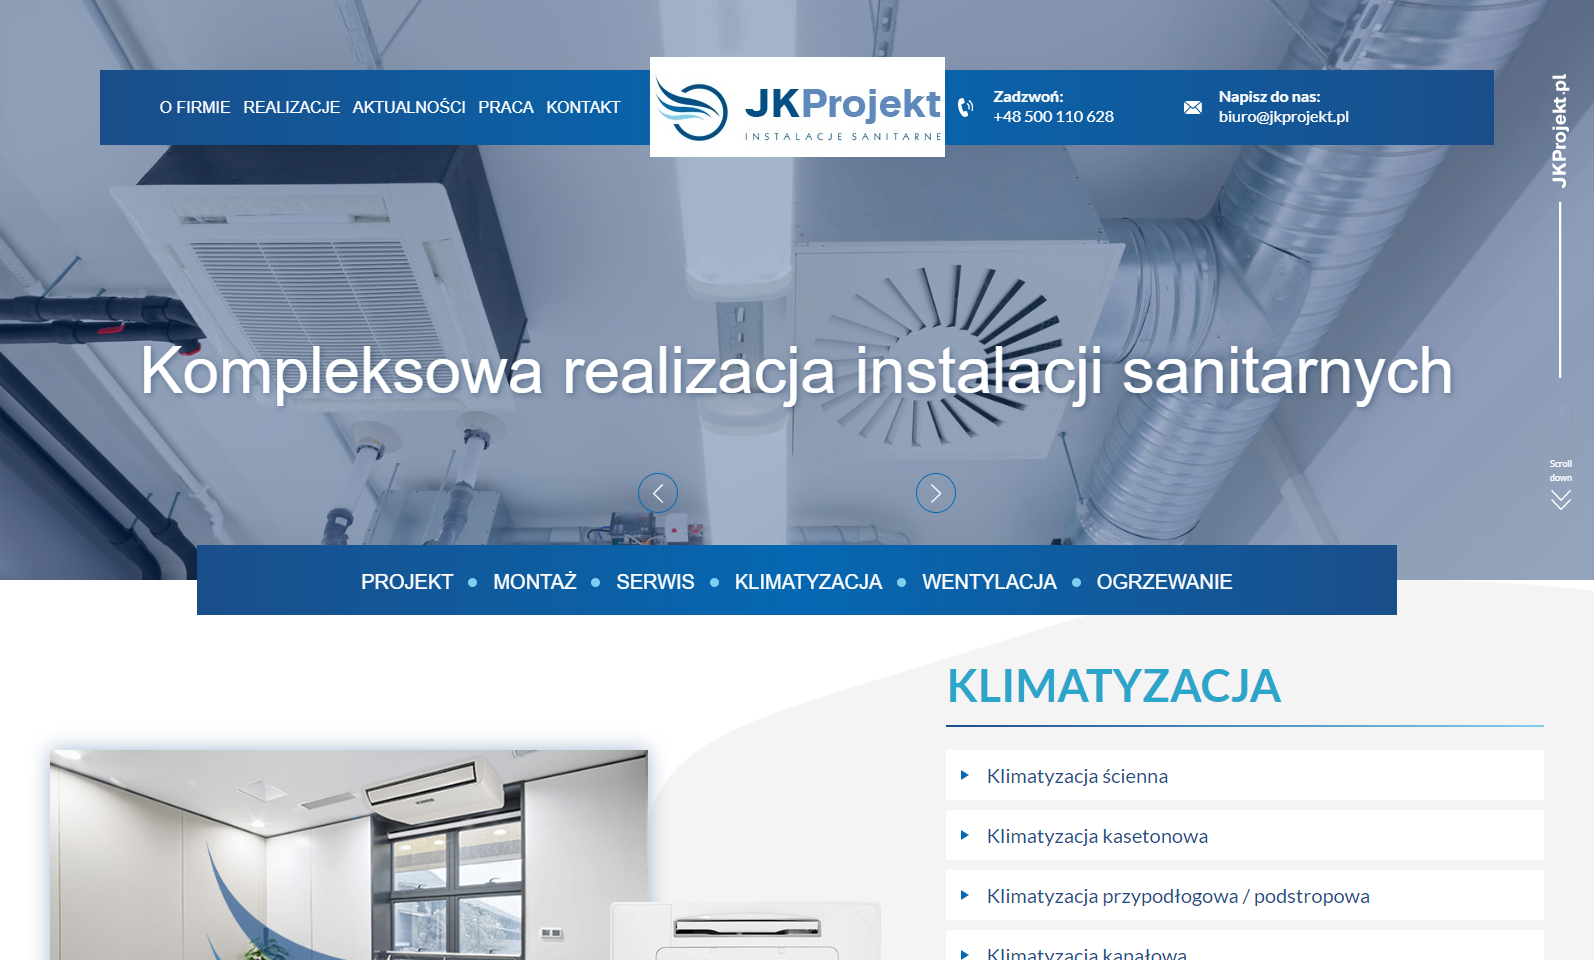 jkprojekt